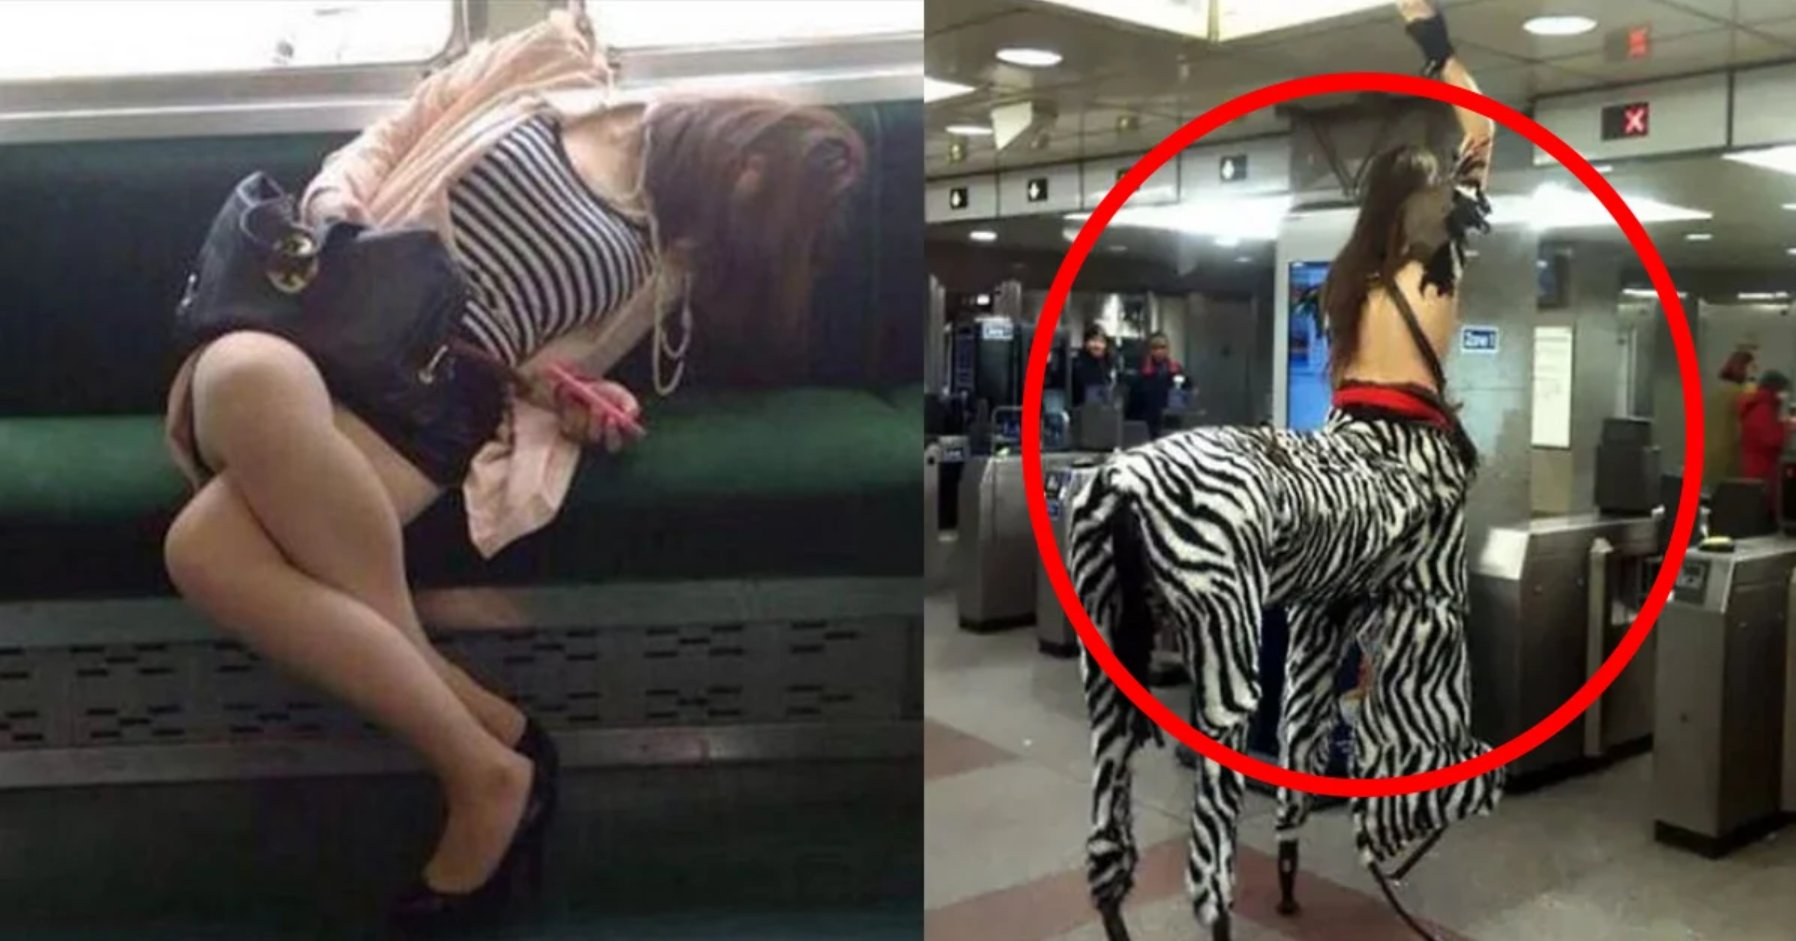 efbc91efbc91.png?resize=1200,630 - 【腹筋崩壊】電車の中で偶然に見かけた爆笑光景まとめ!